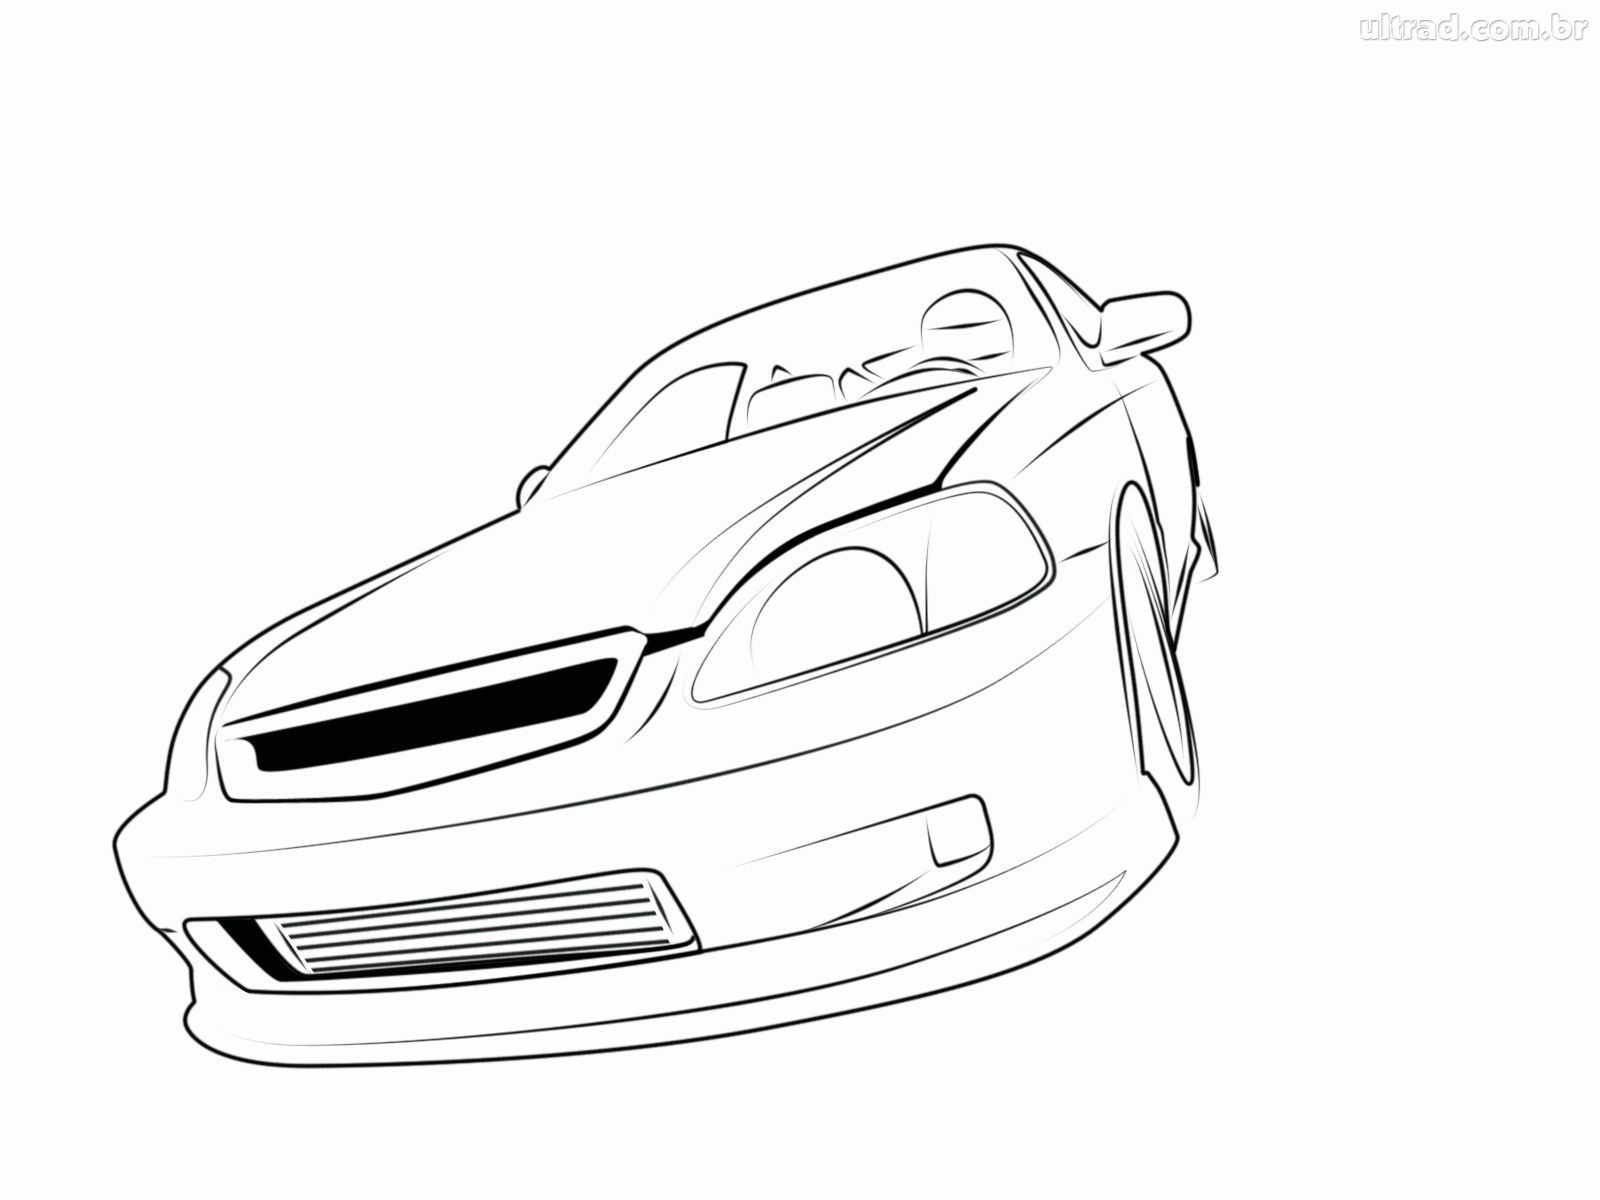 Honda Drawing At Getdrawings